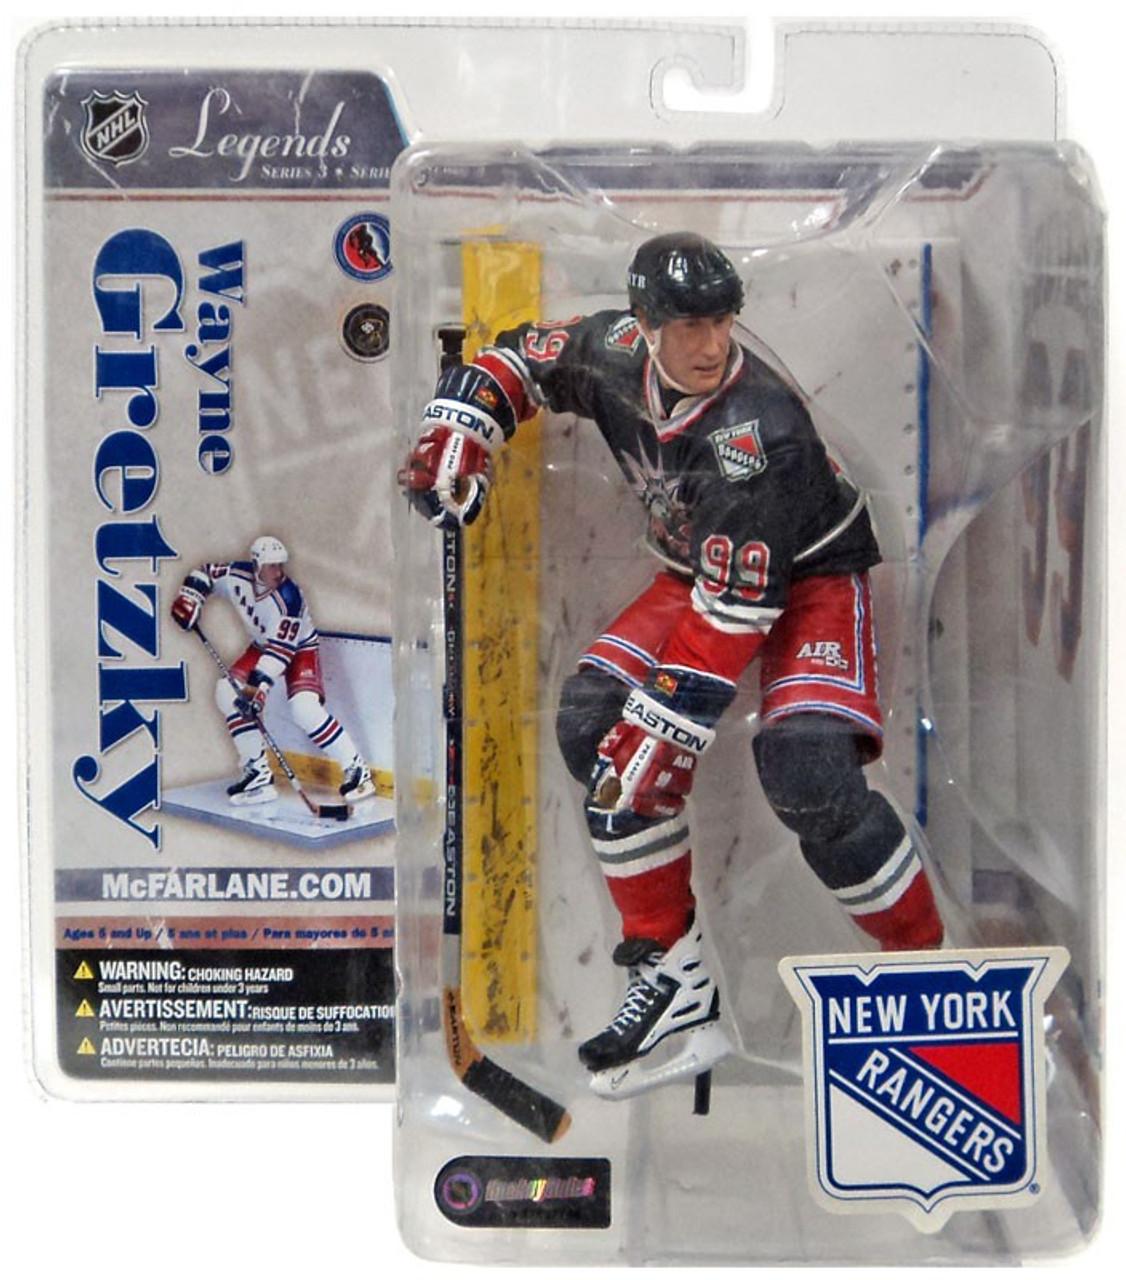 McFarlane Toys NHL New York Rangers Sports Picks Legends Series 3 Wayne  Gretzky Action Figure Blue Liberty Jersey Variant - ToyWiz 3cadf9bce